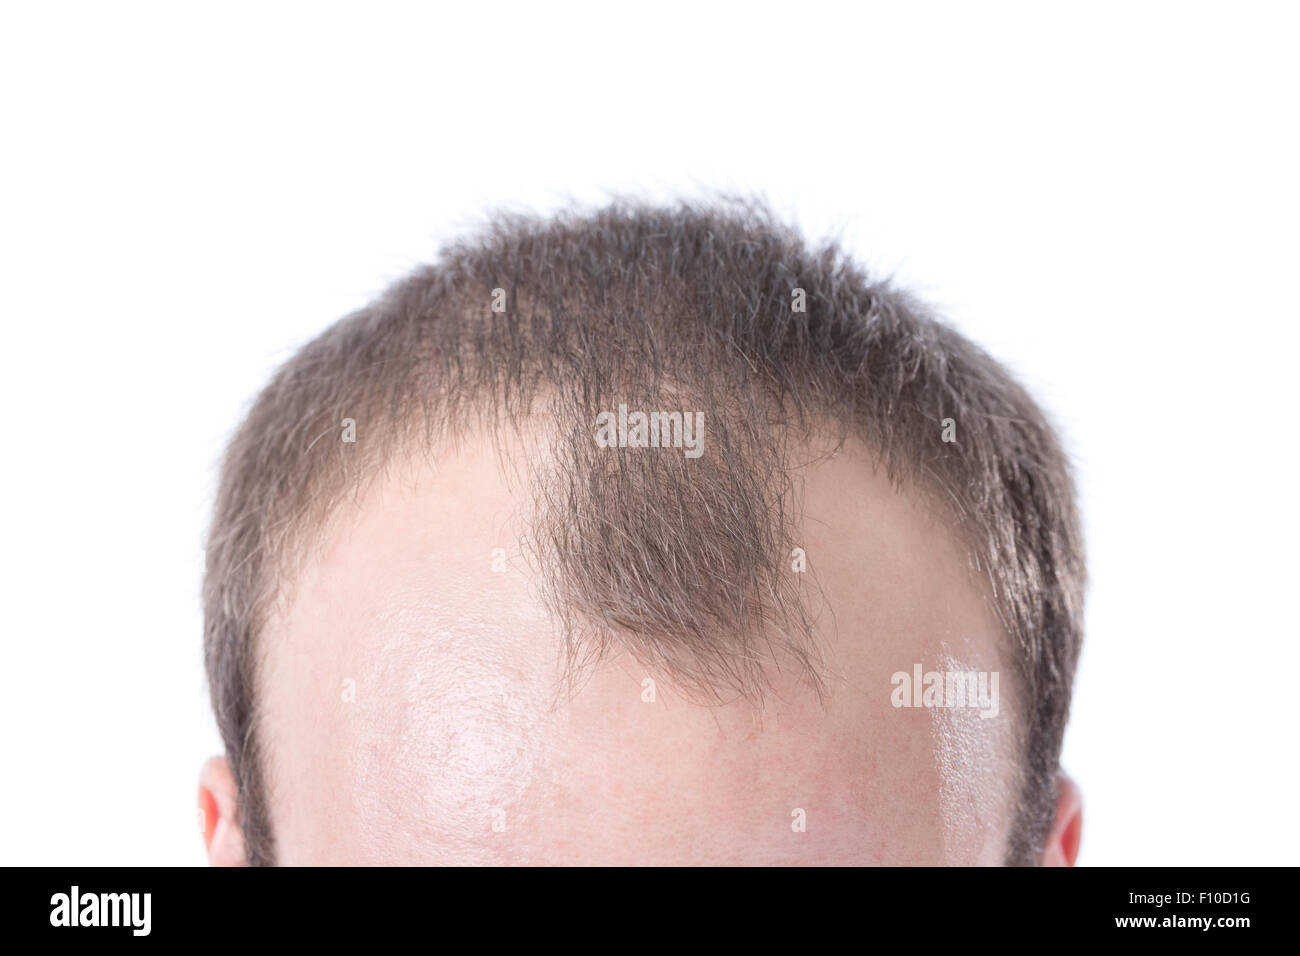 how do you get a receding hairline